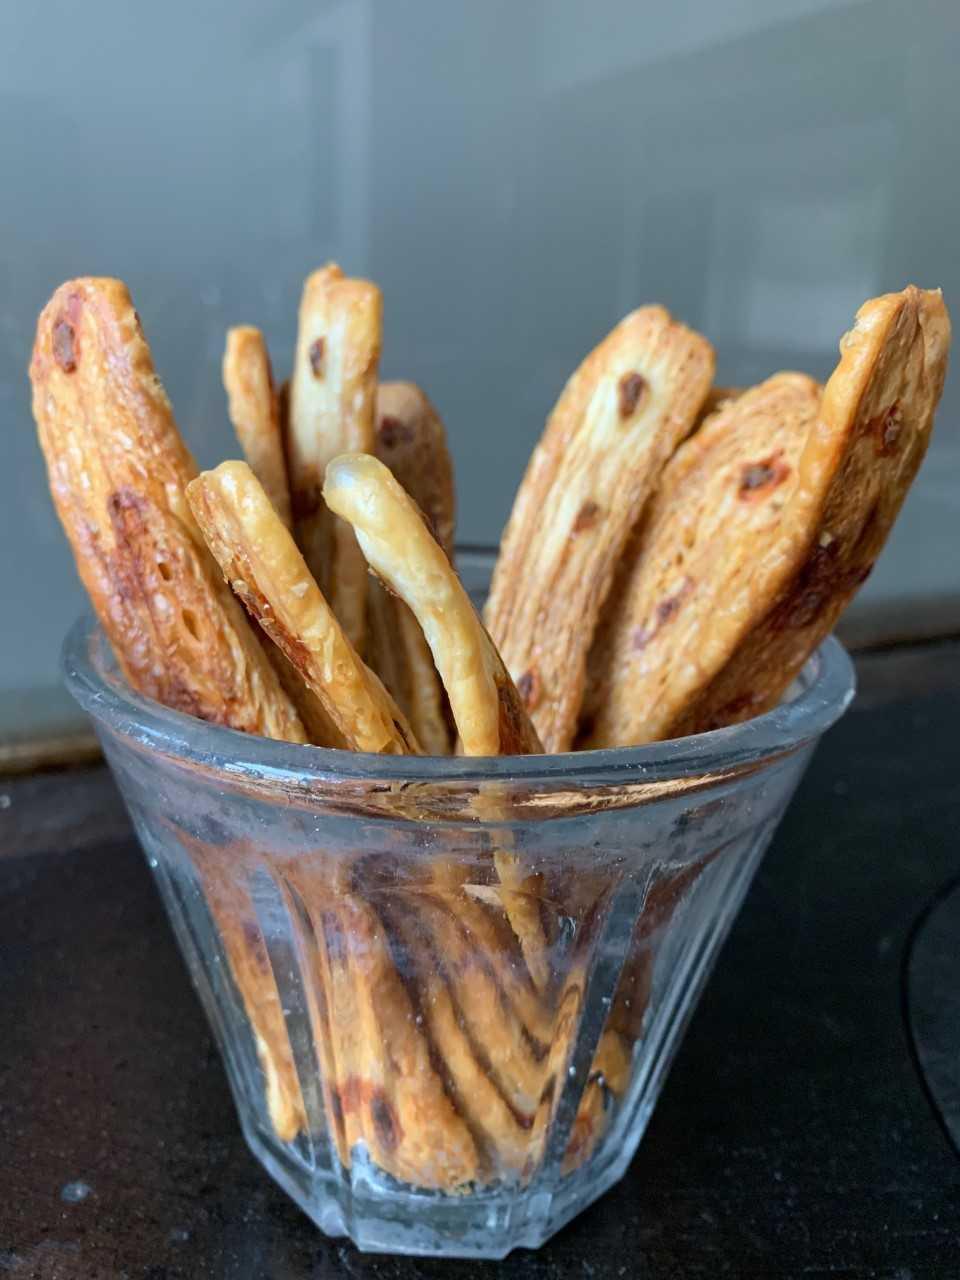 mr-anchovy sticks image